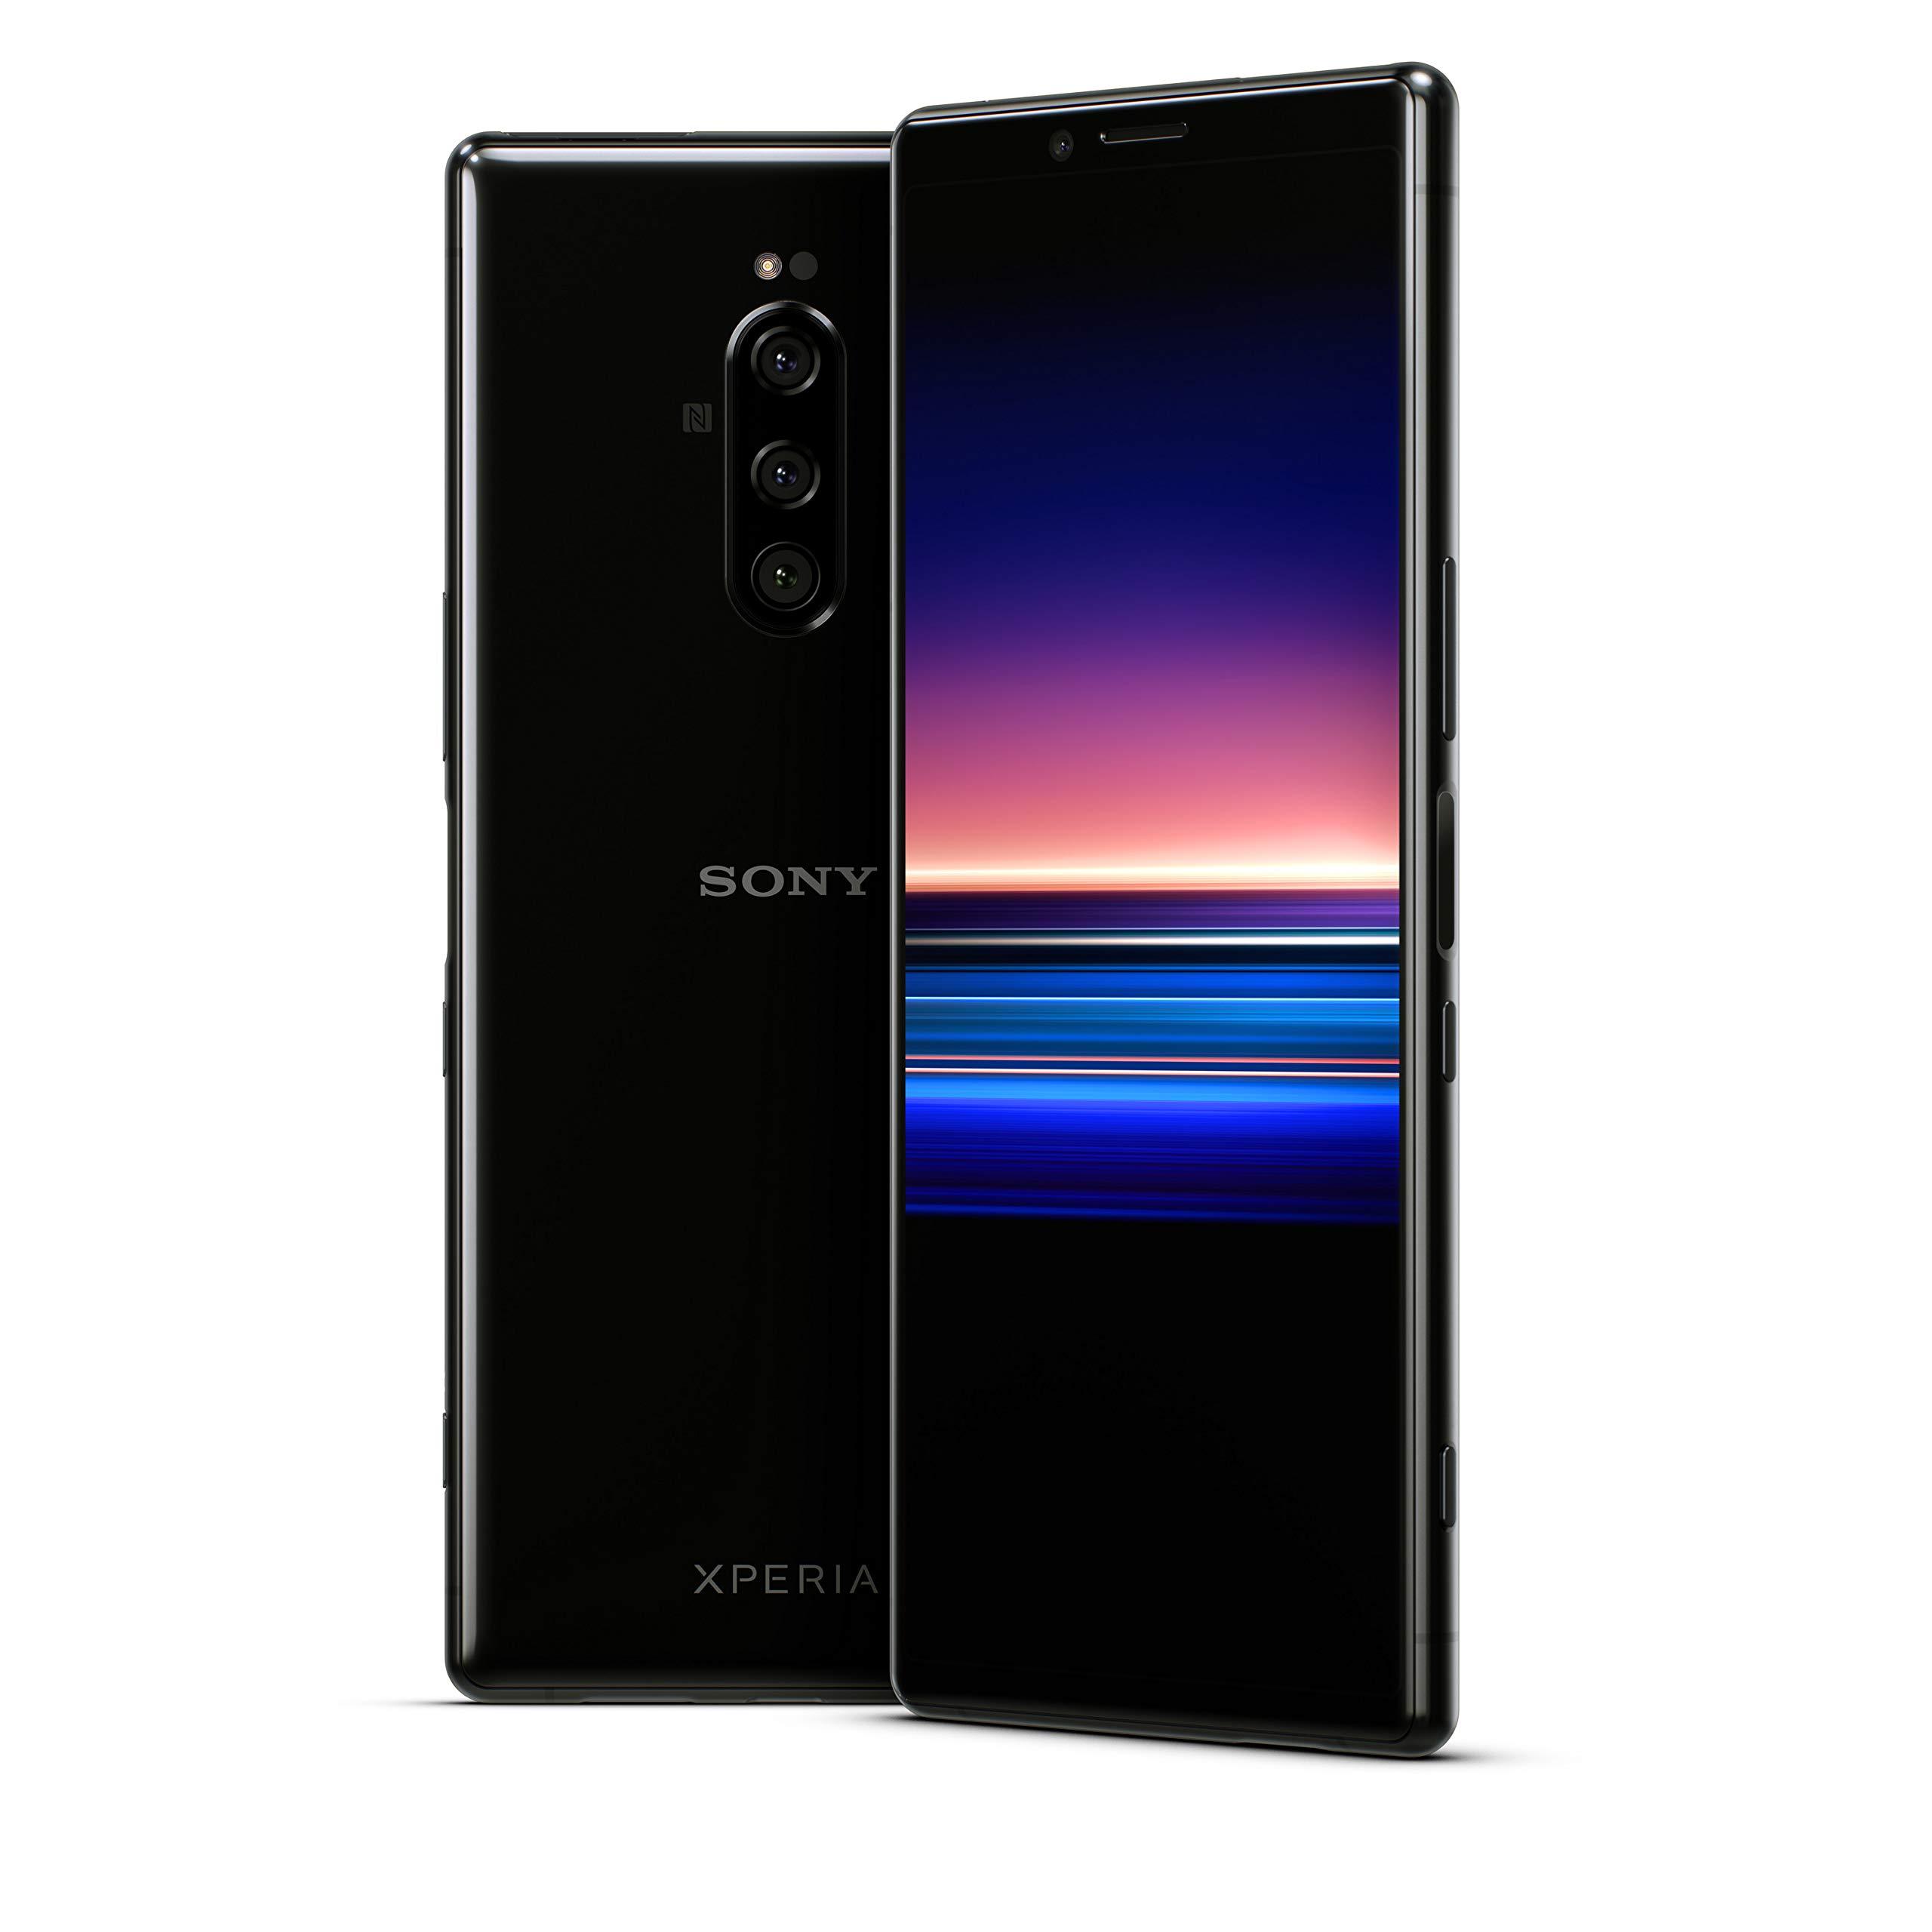 "Sony Xperia 1 Unlocked Smartphone 6.5"" 4K HDR OLED CinemaWide Display, 128GB - Black - (US Warranty)"